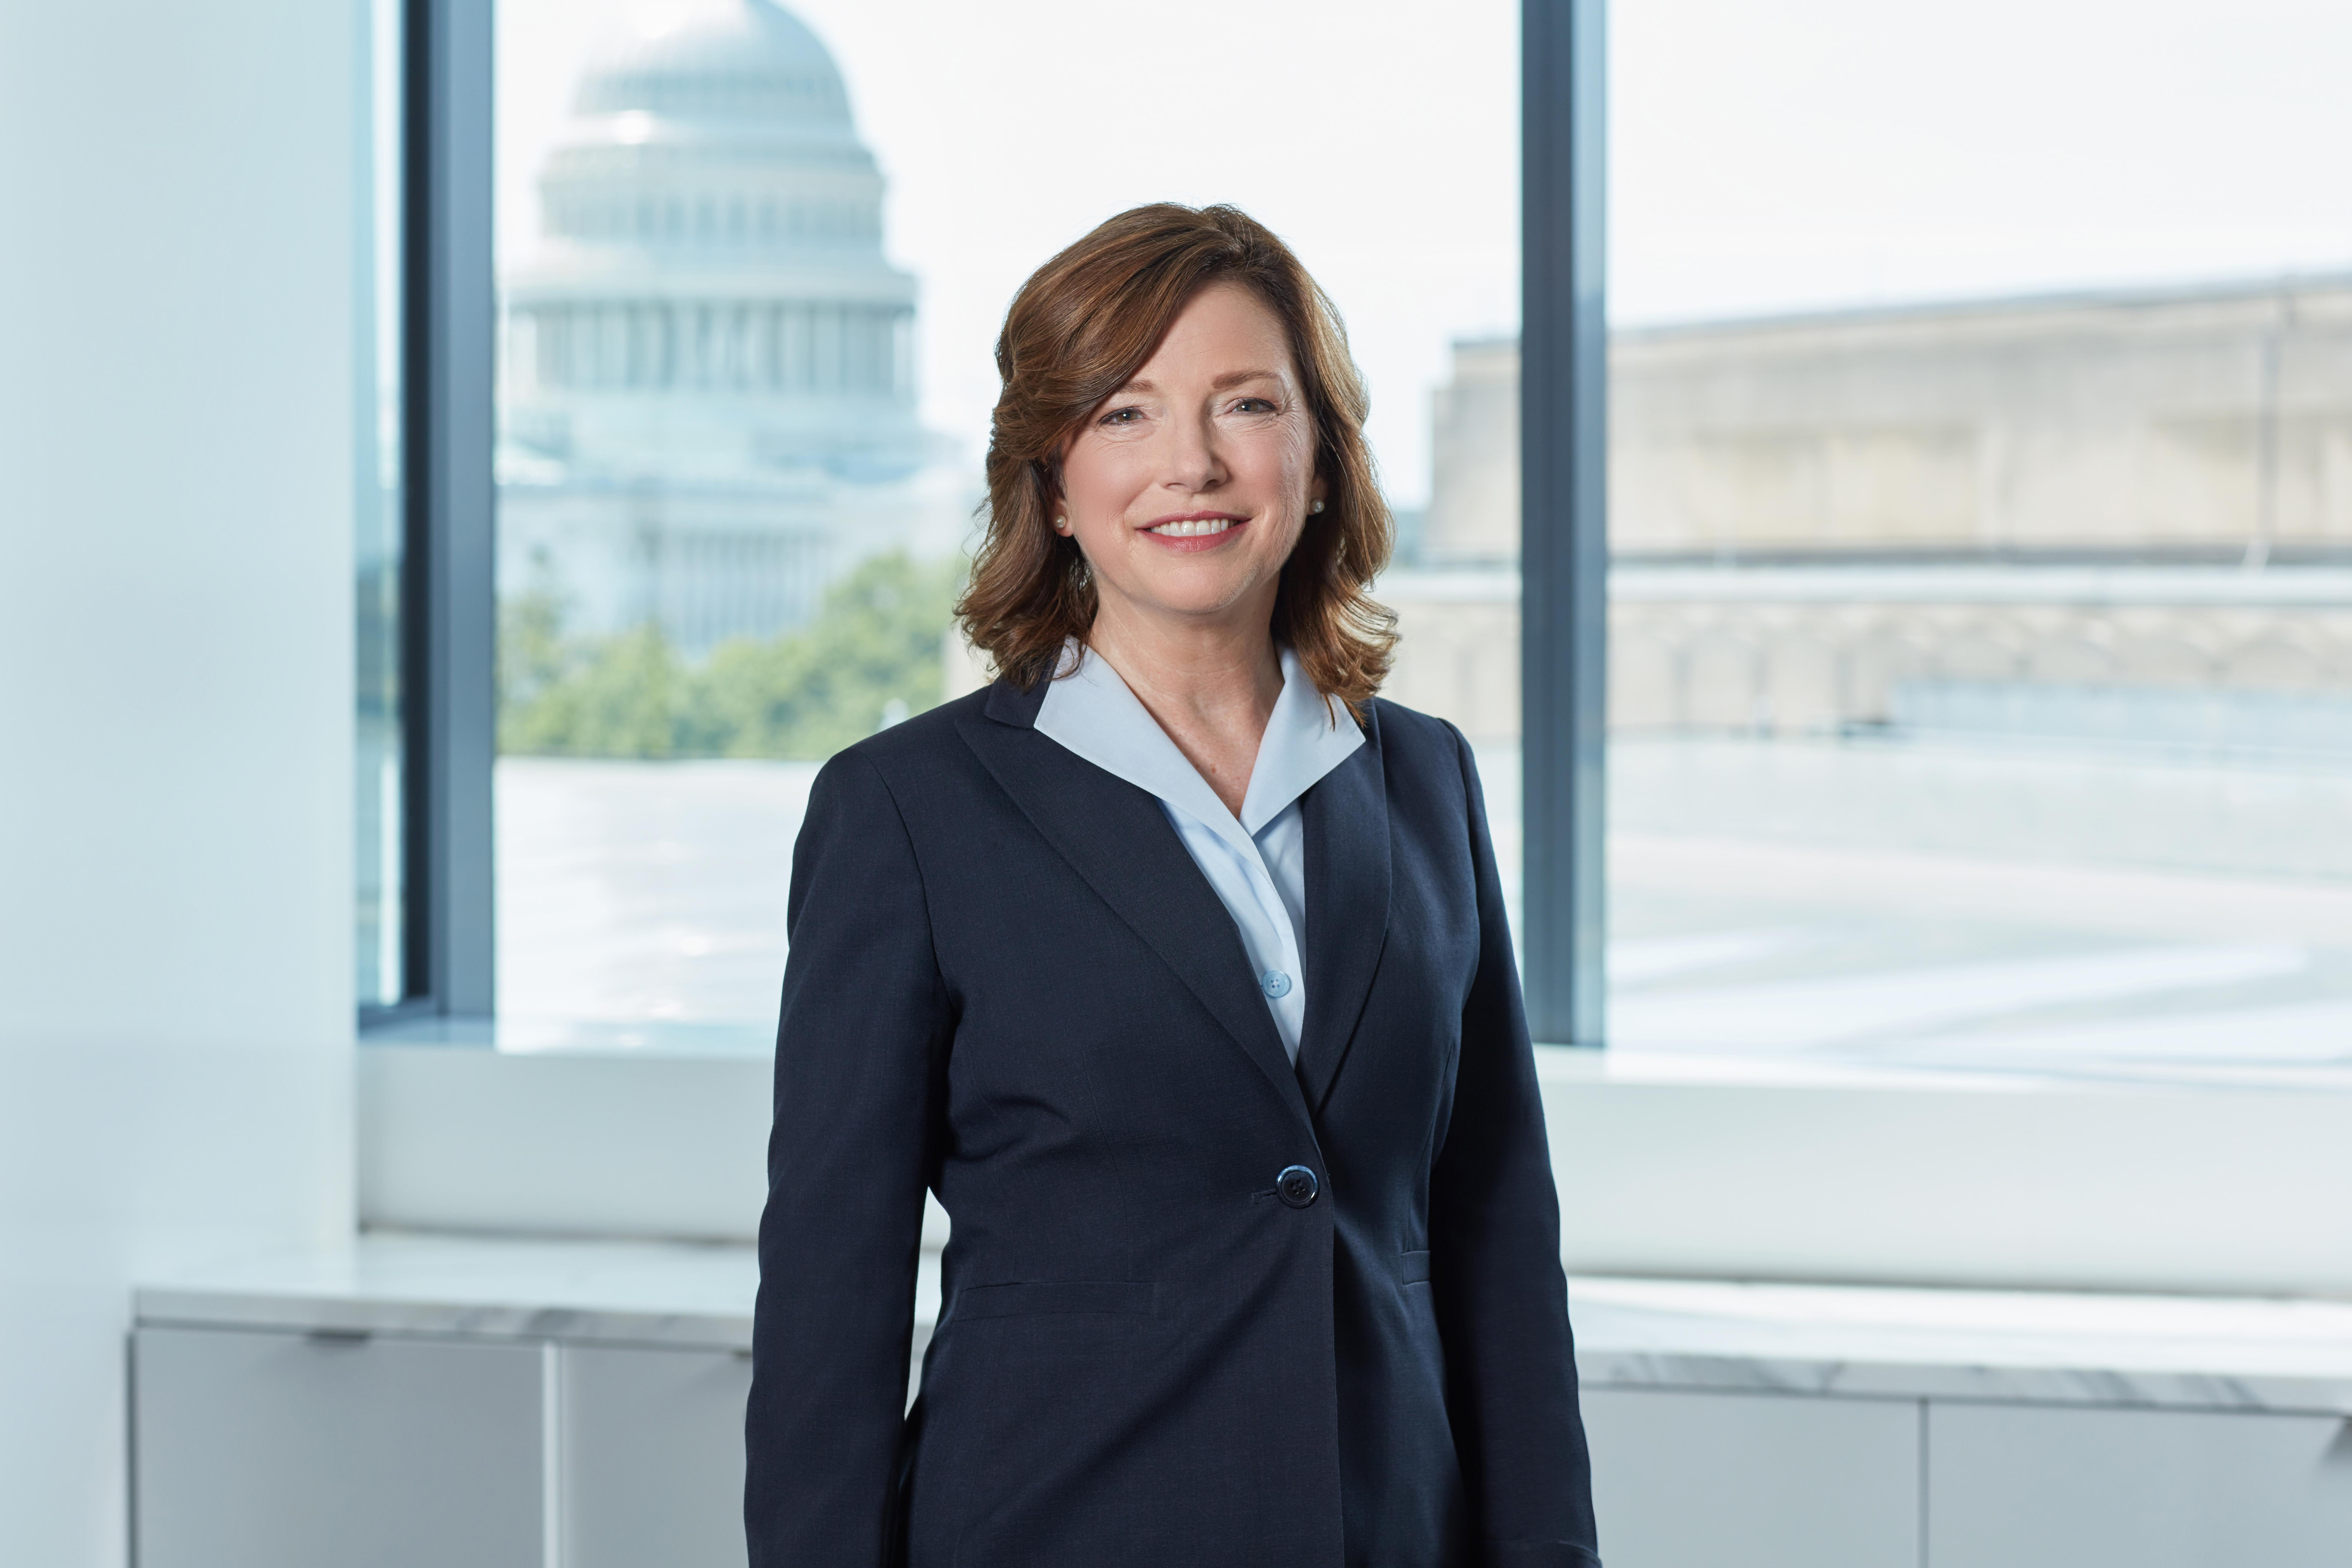 Barbara Humpton became the U.S. CEO of Siemens in June 2018.